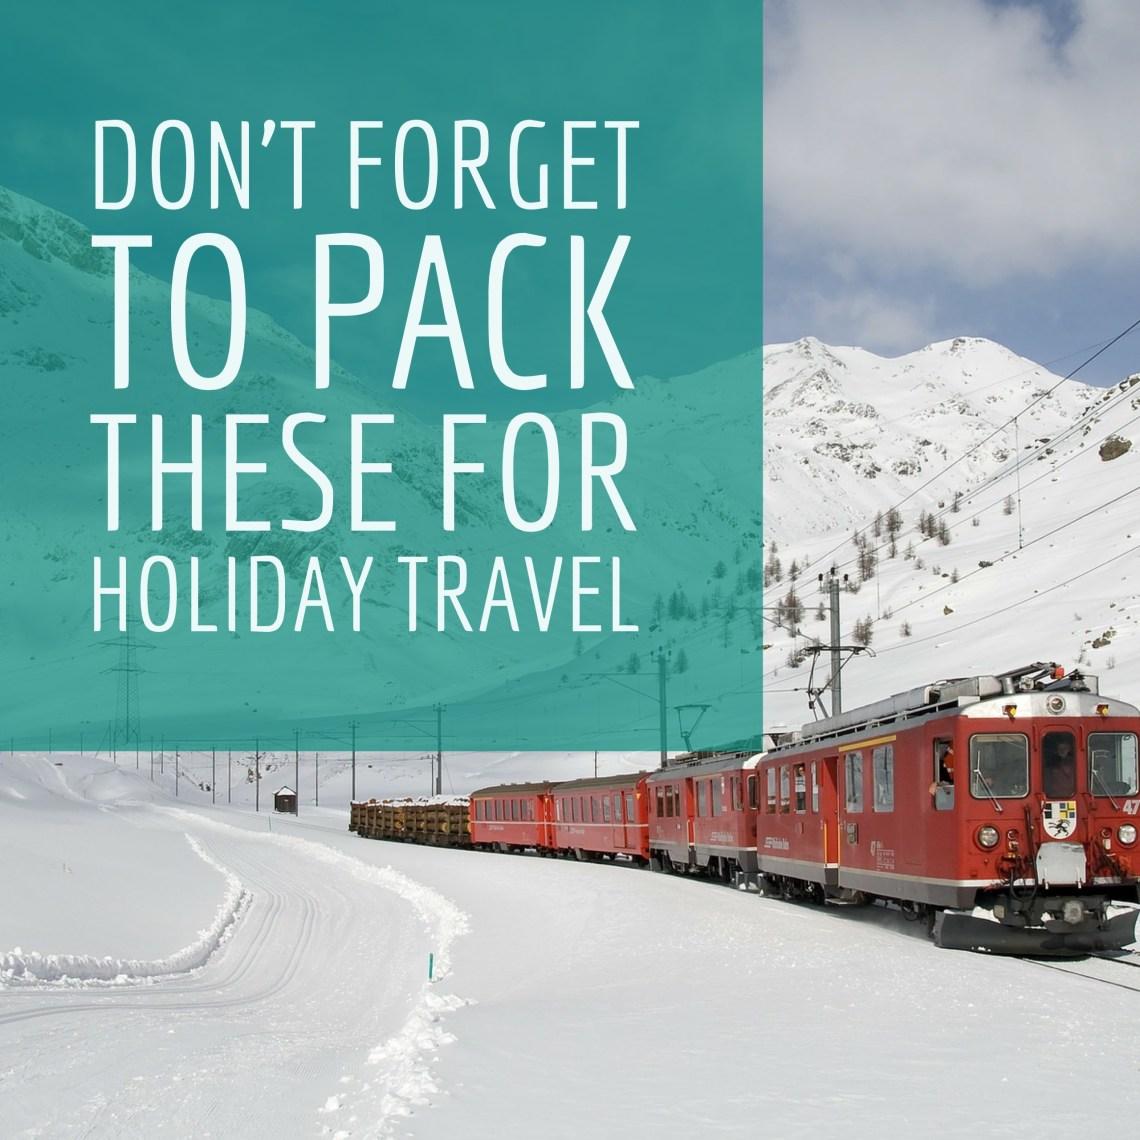 holiday_travel